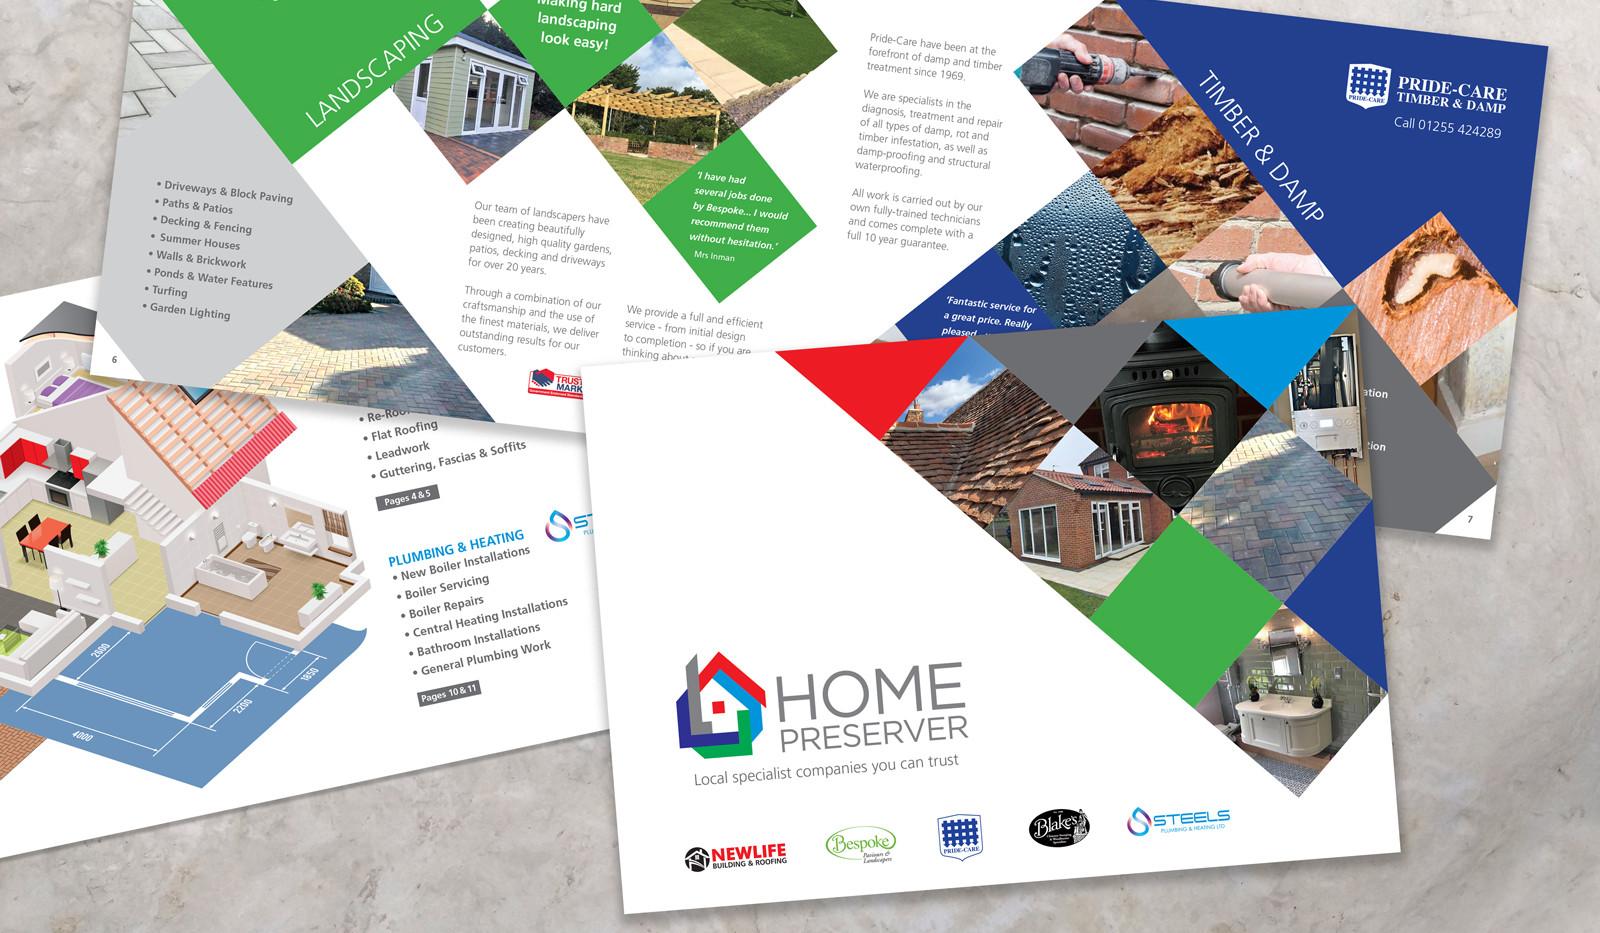 Home Preserver Brochure